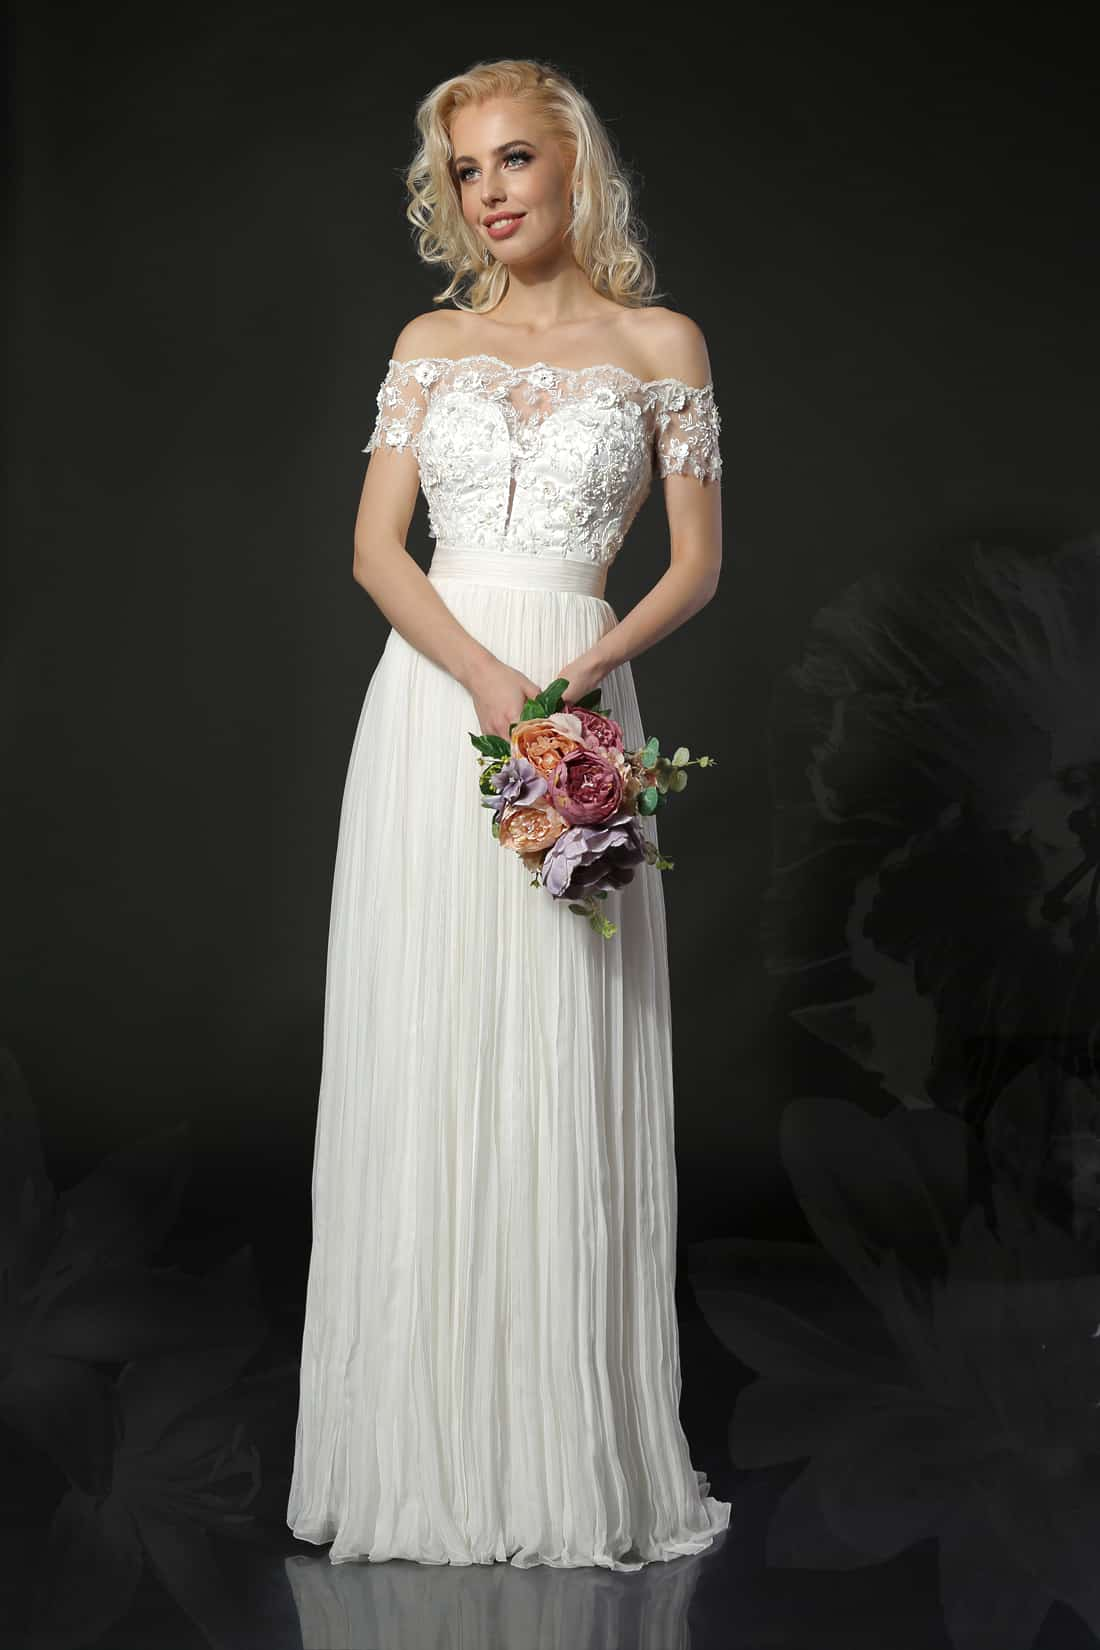 Celeste- Colectia Feeria - Adora Sposa